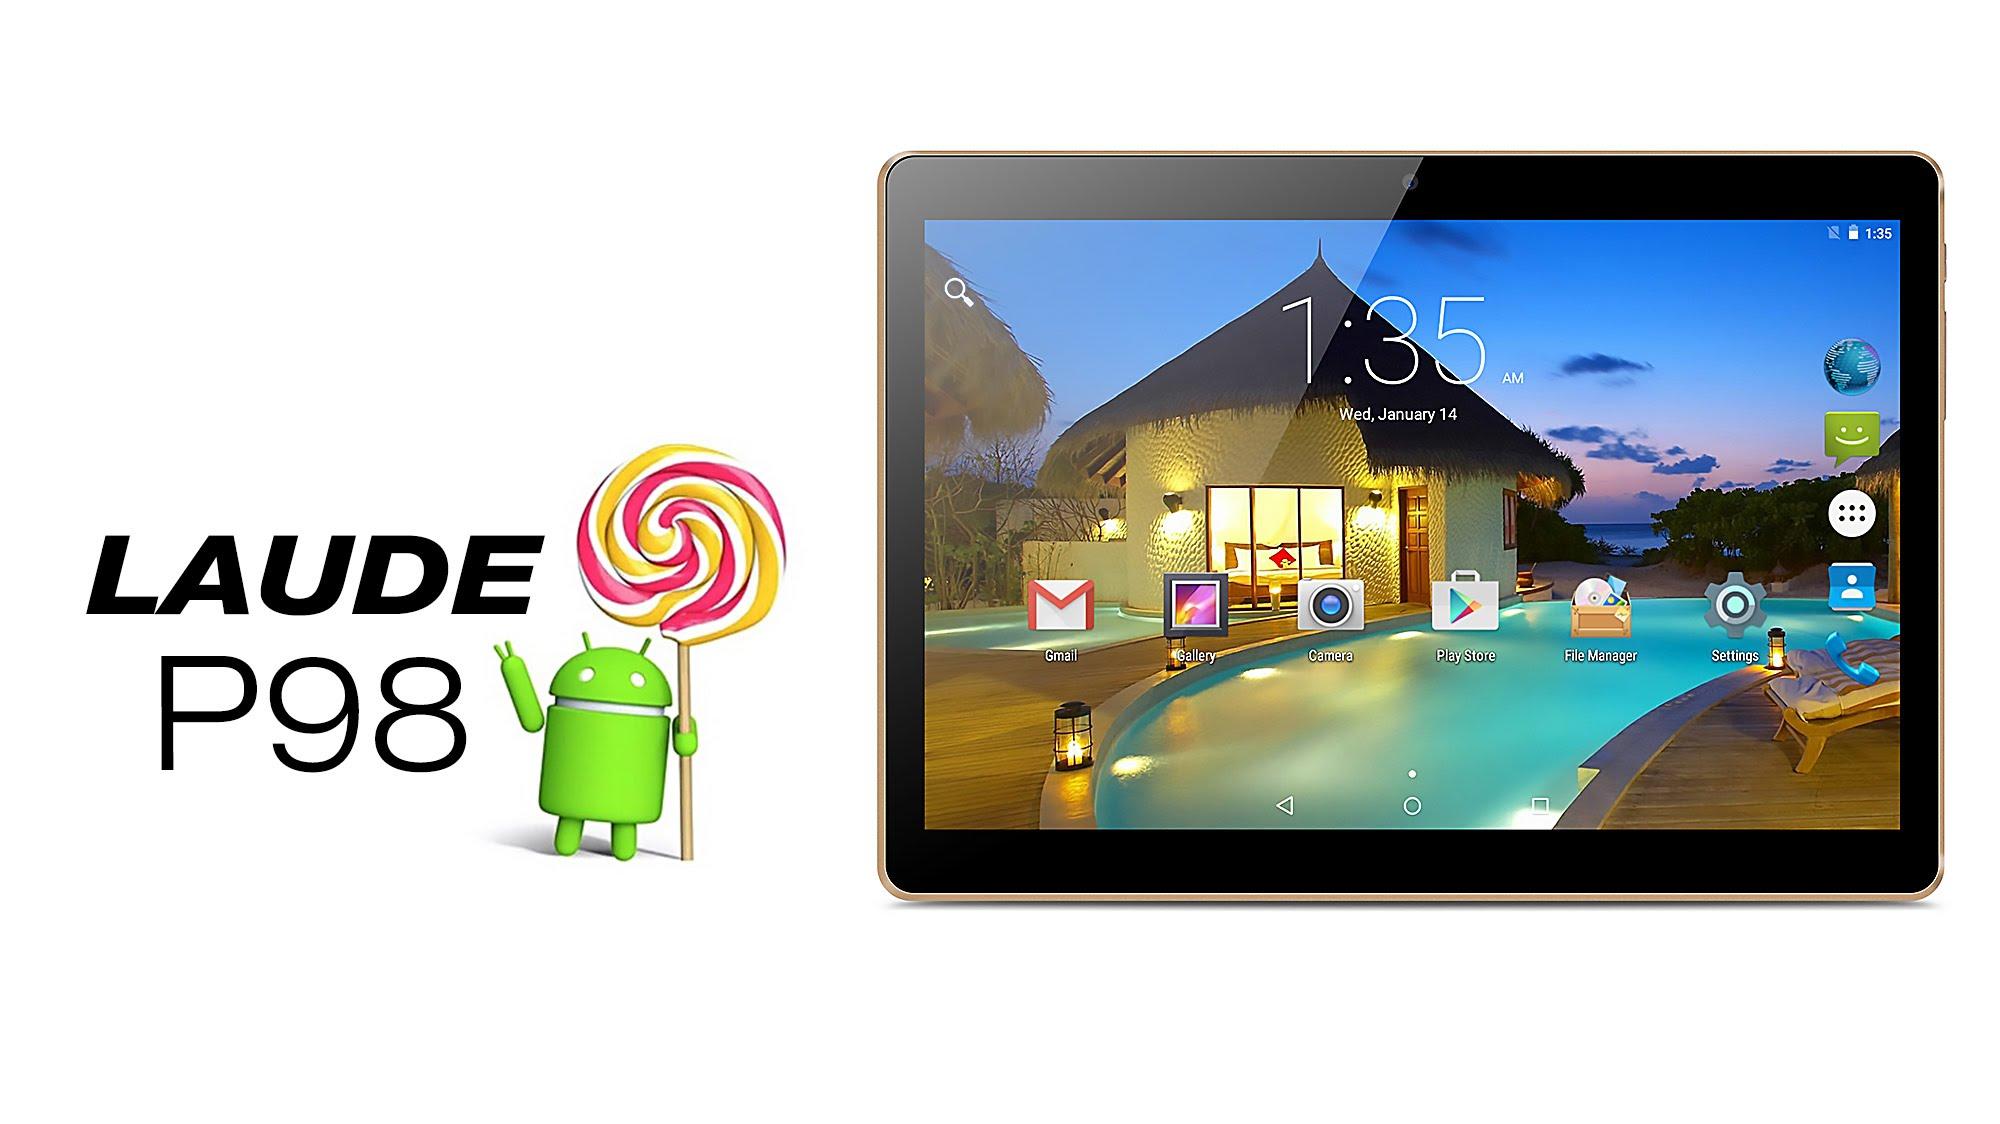 laude p98 9 6 zoll lte hd tablet phone pc g nstig kaufen. Black Bedroom Furniture Sets. Home Design Ideas